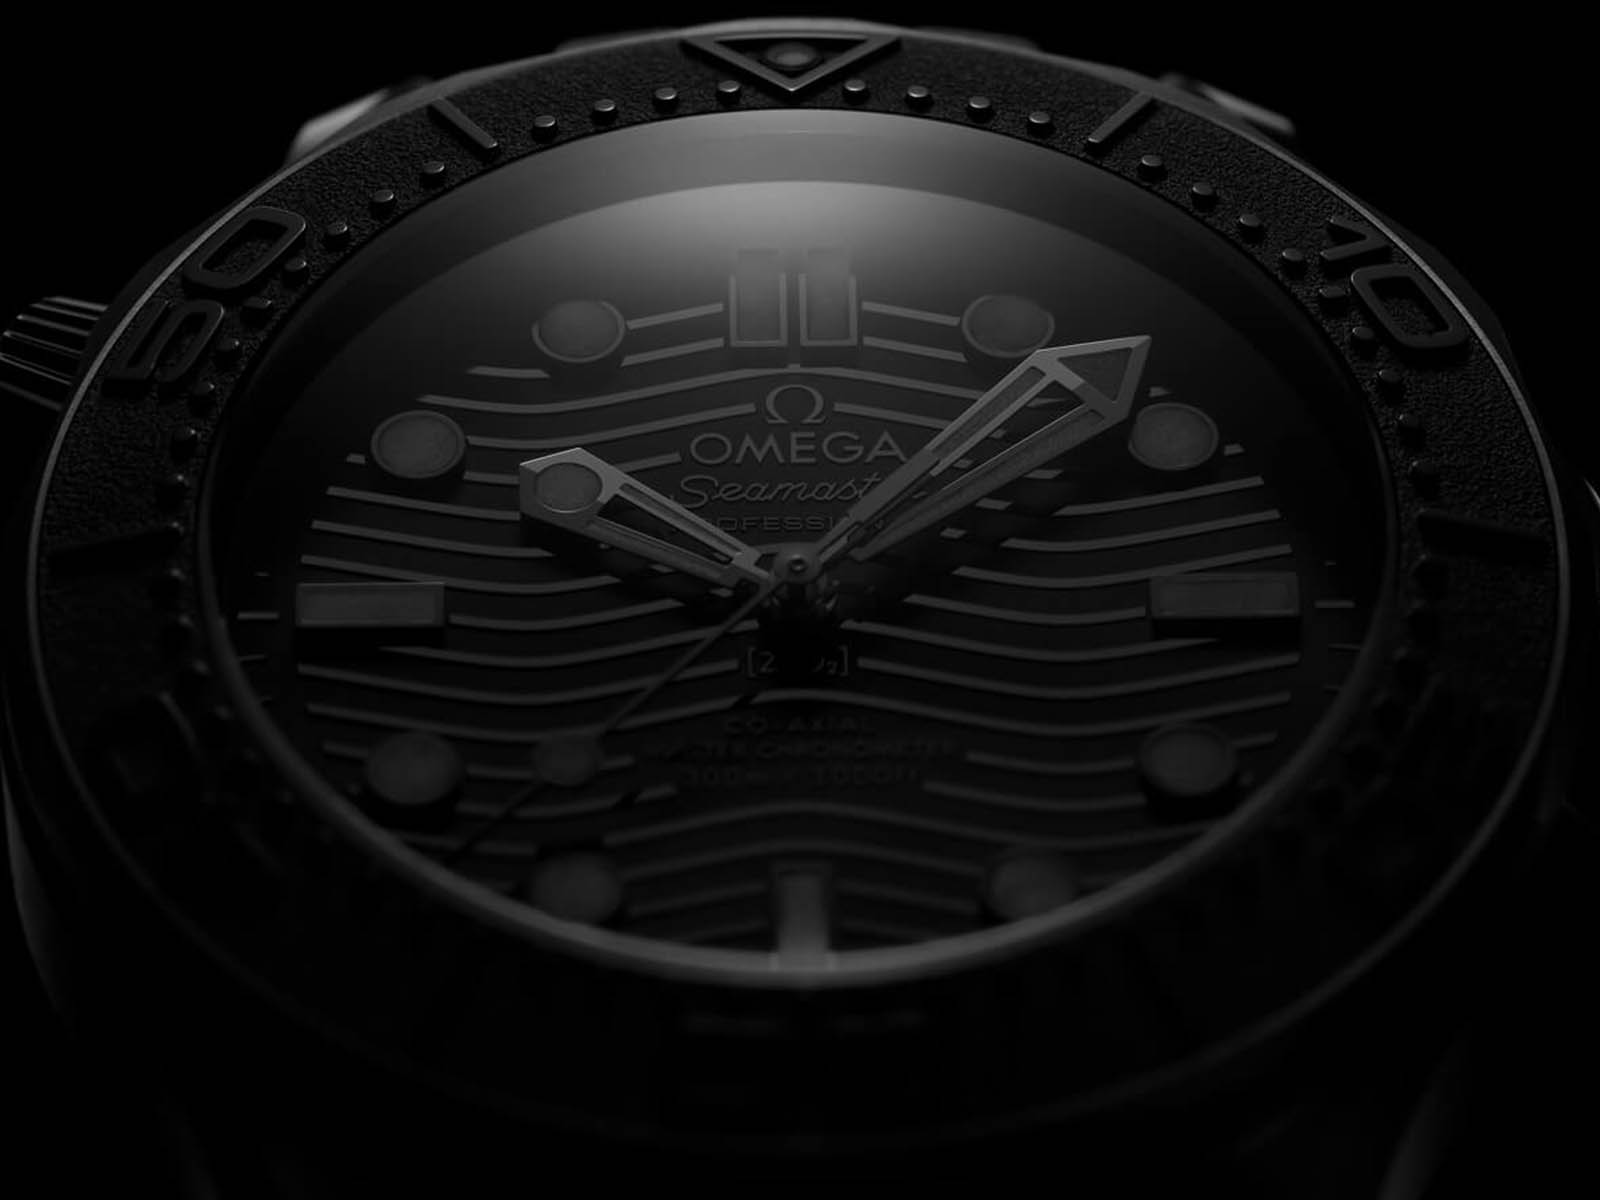 210-92-44-20-01-003-omega-seamaster-300-diver-black-black-4.jpg